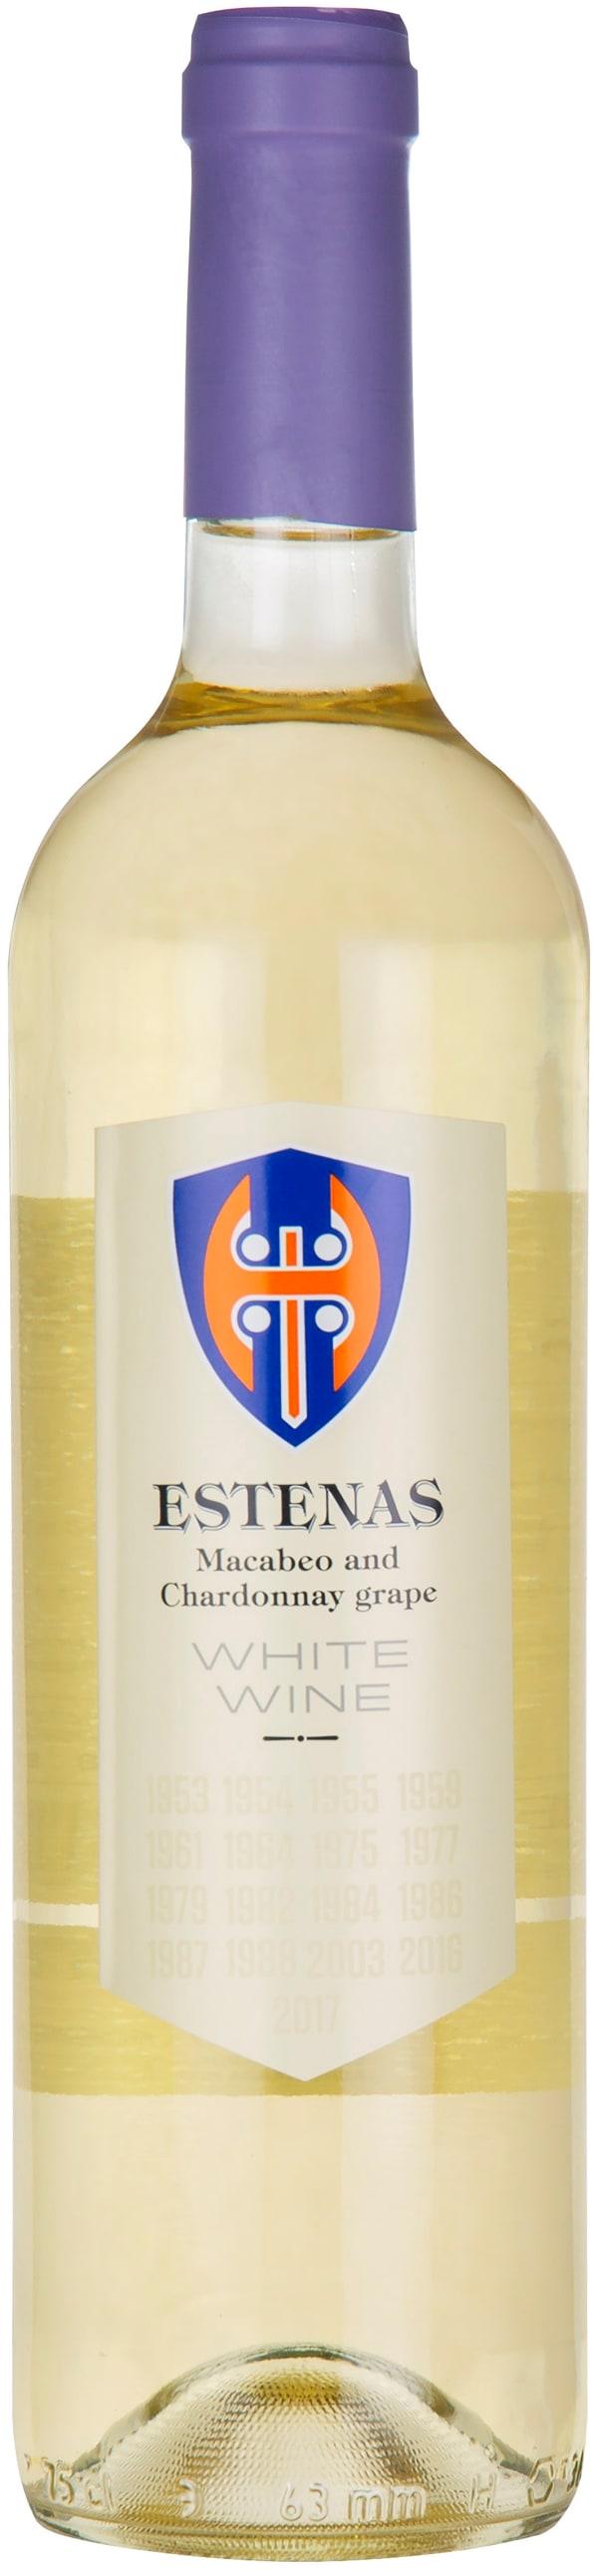 Tappara Estenas Blanco 2018